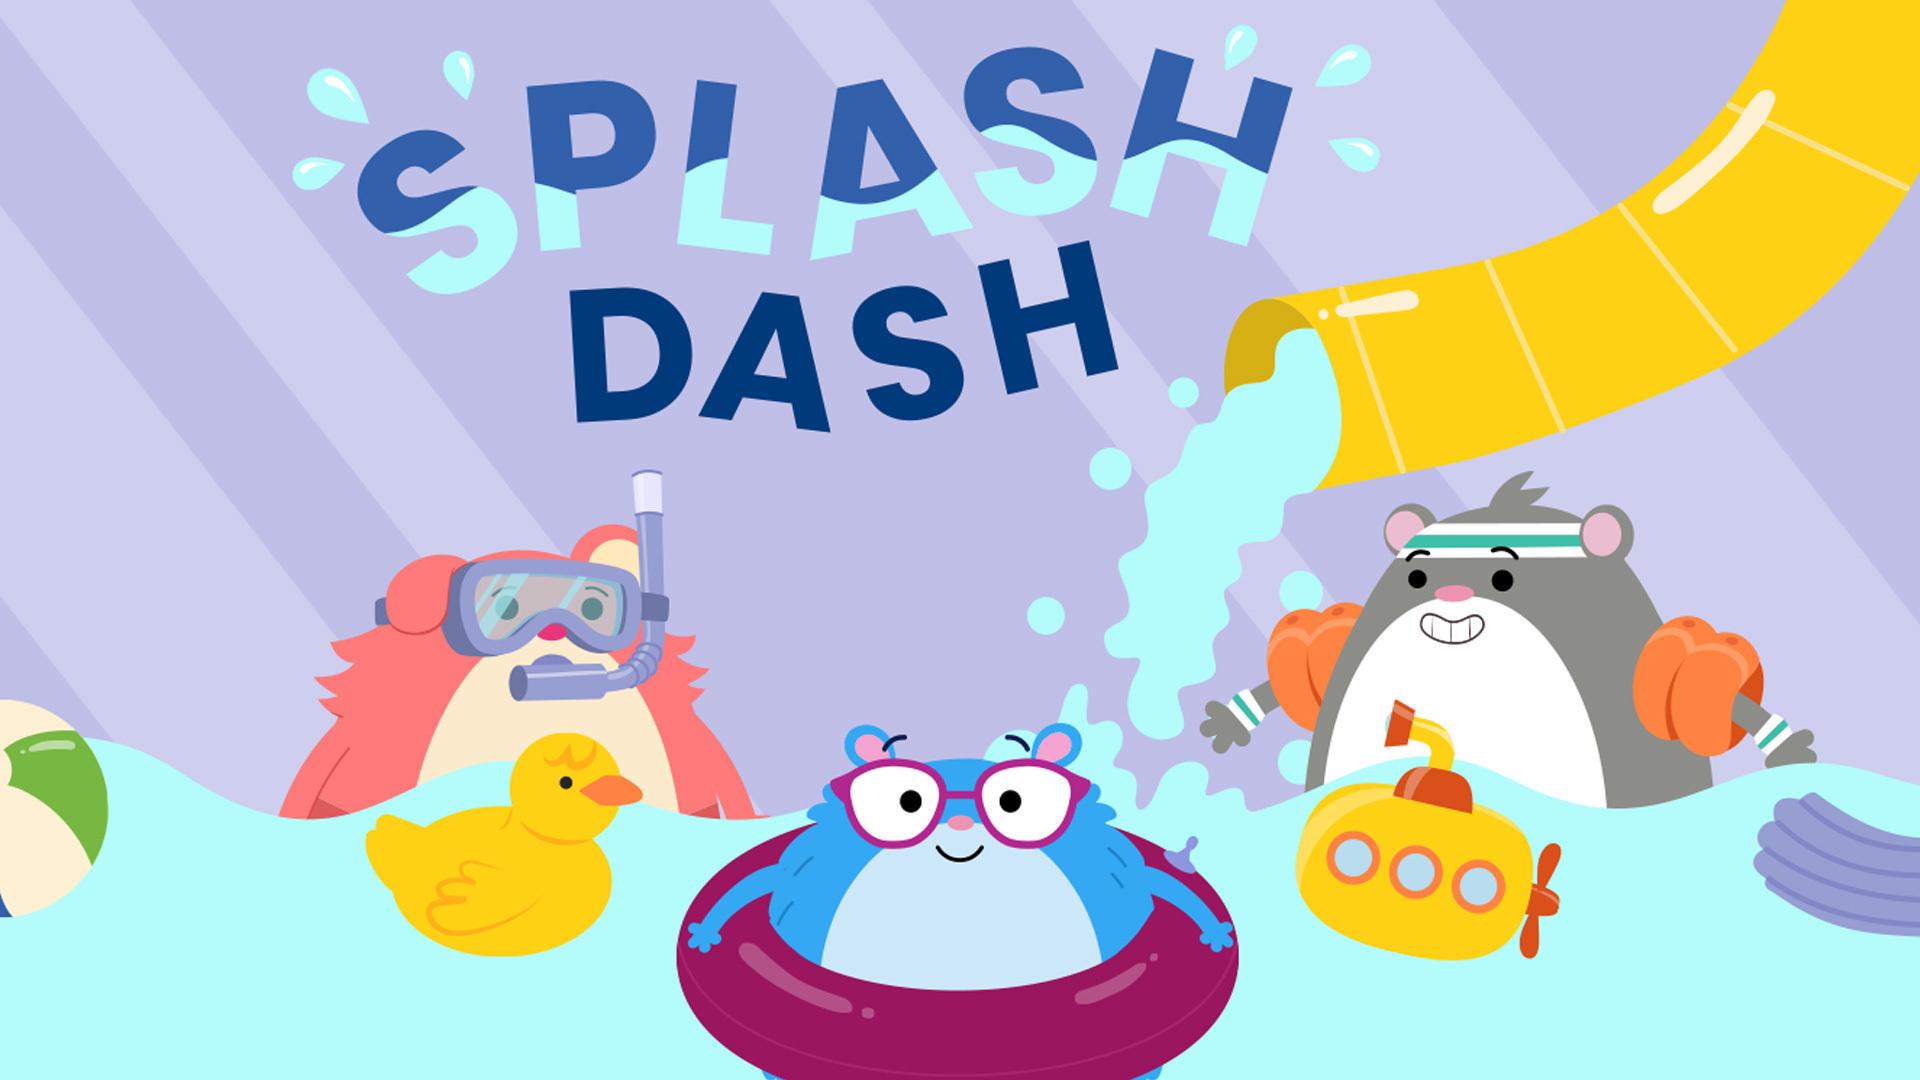 Team Hamster! Splash Dash.